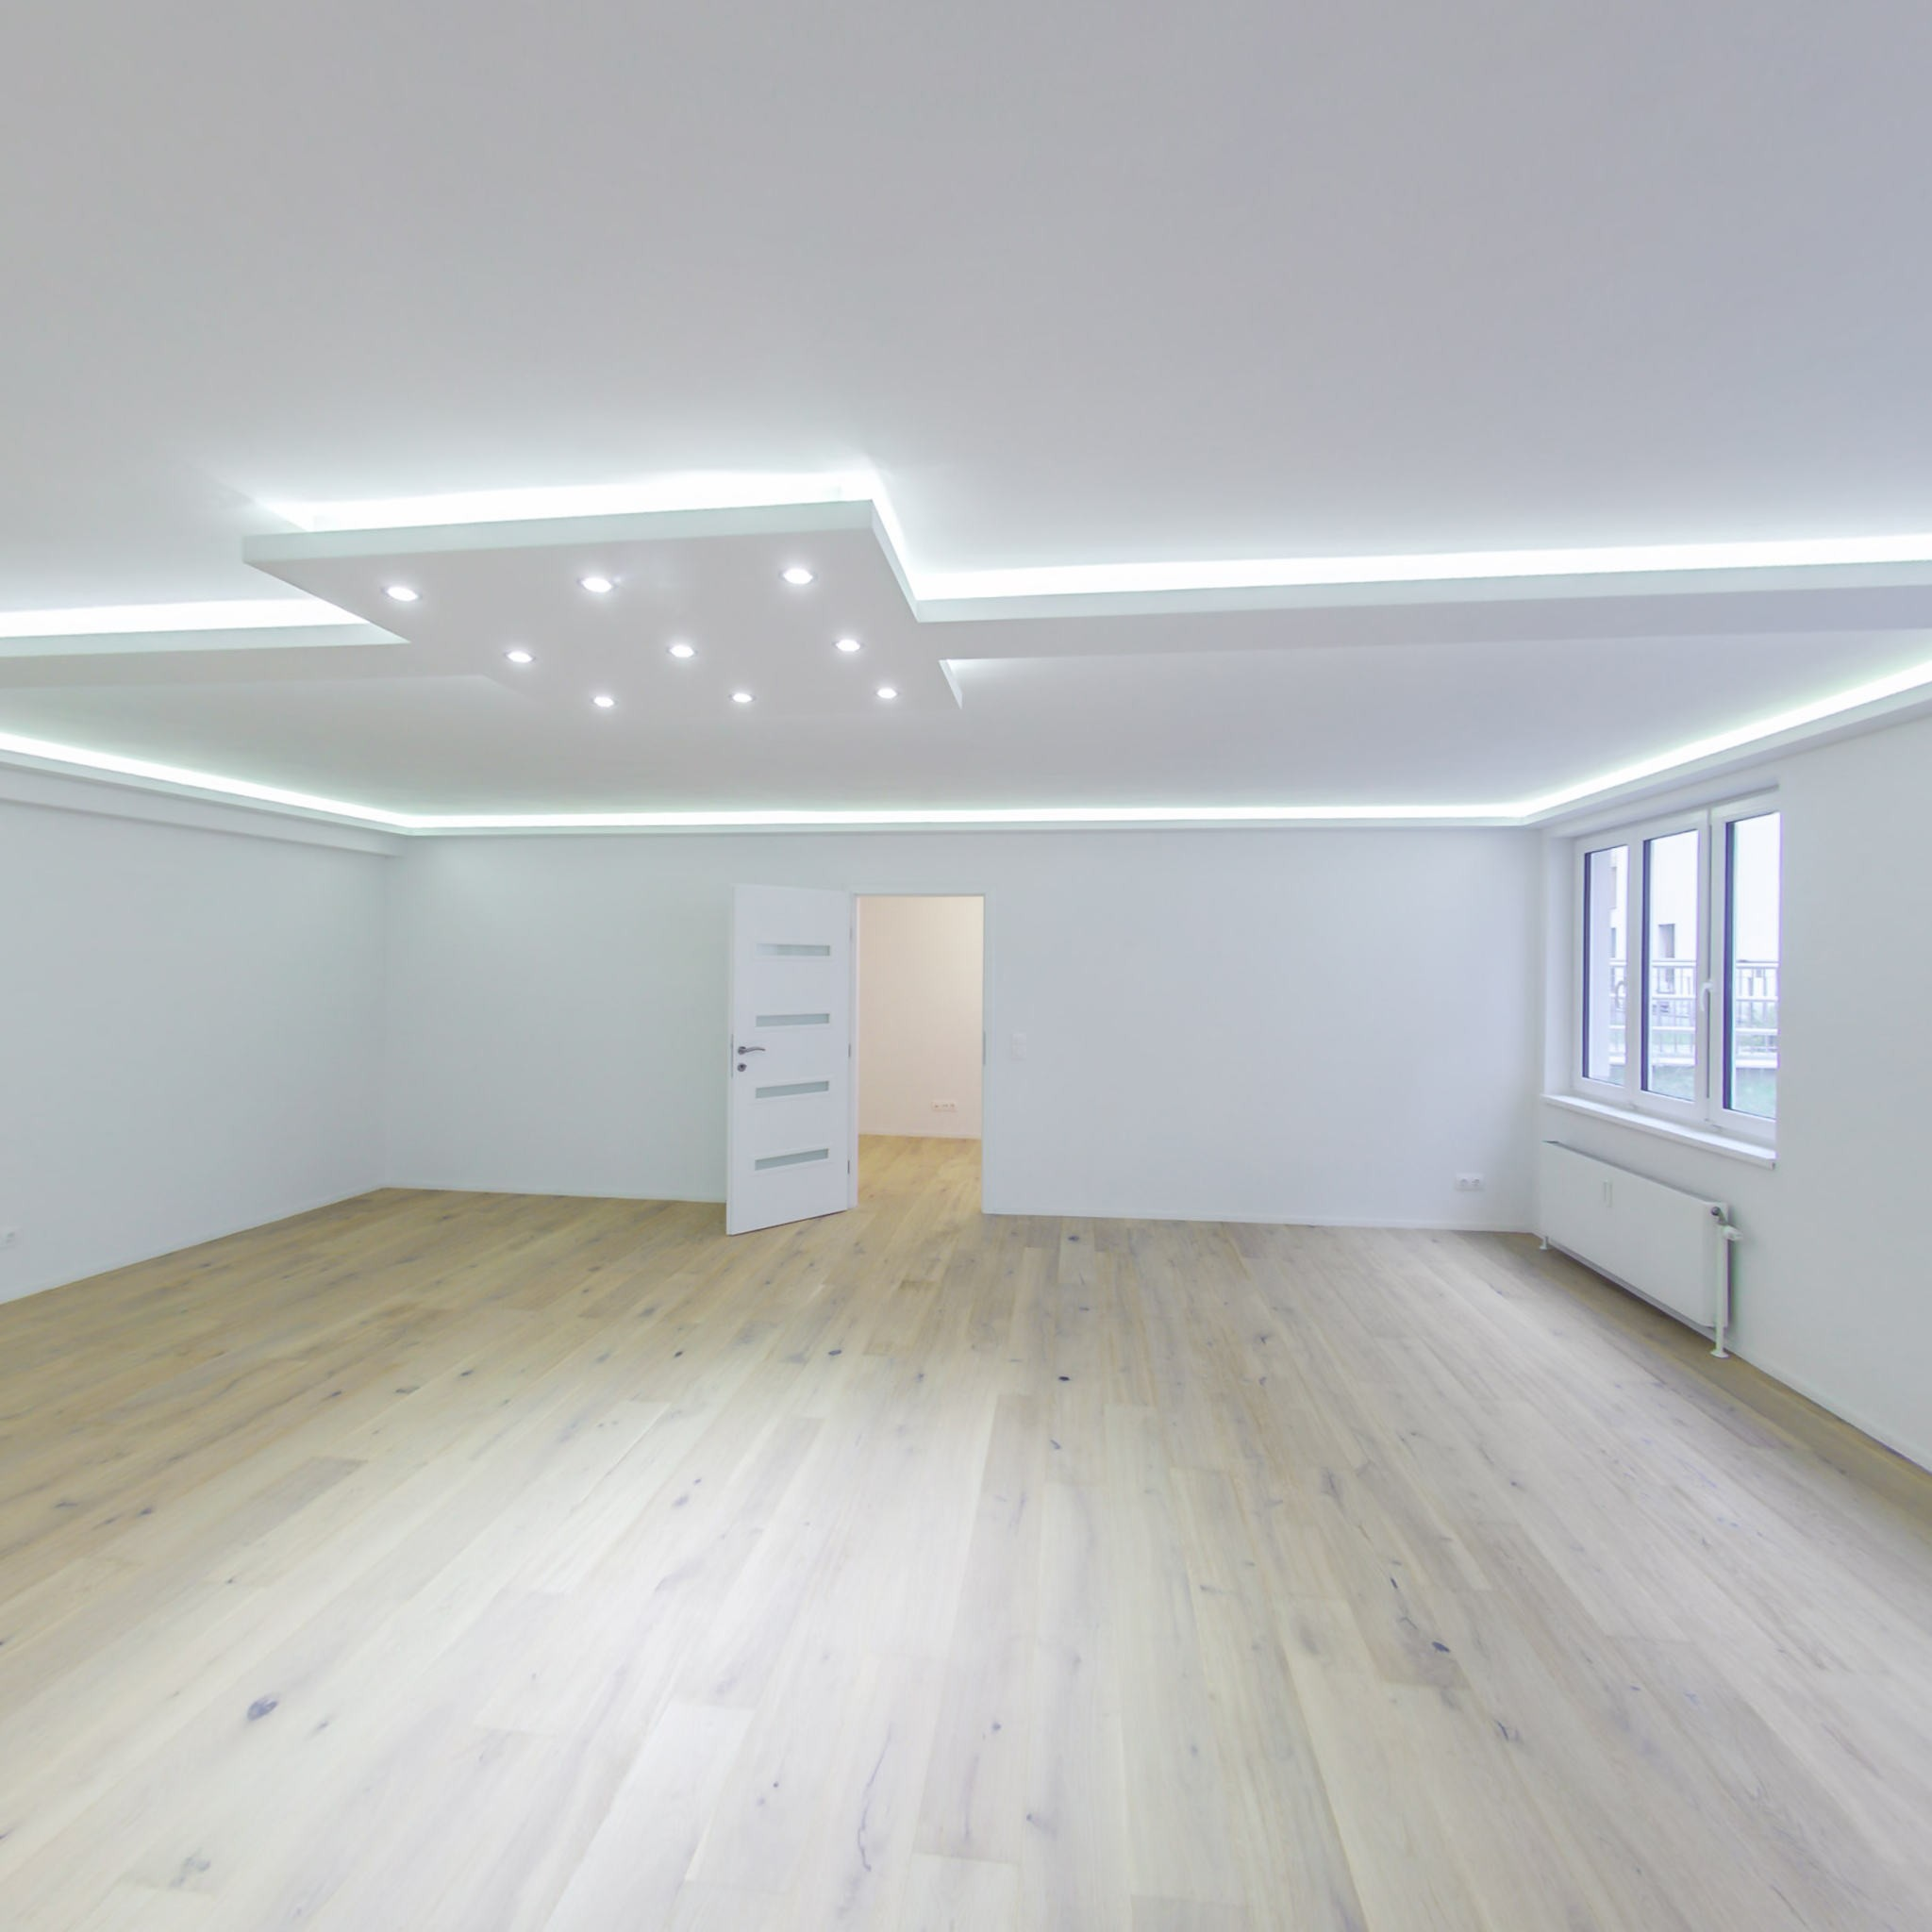 Immobilien_Panorama_Wien_(c)_Maximilian_Rosenberger